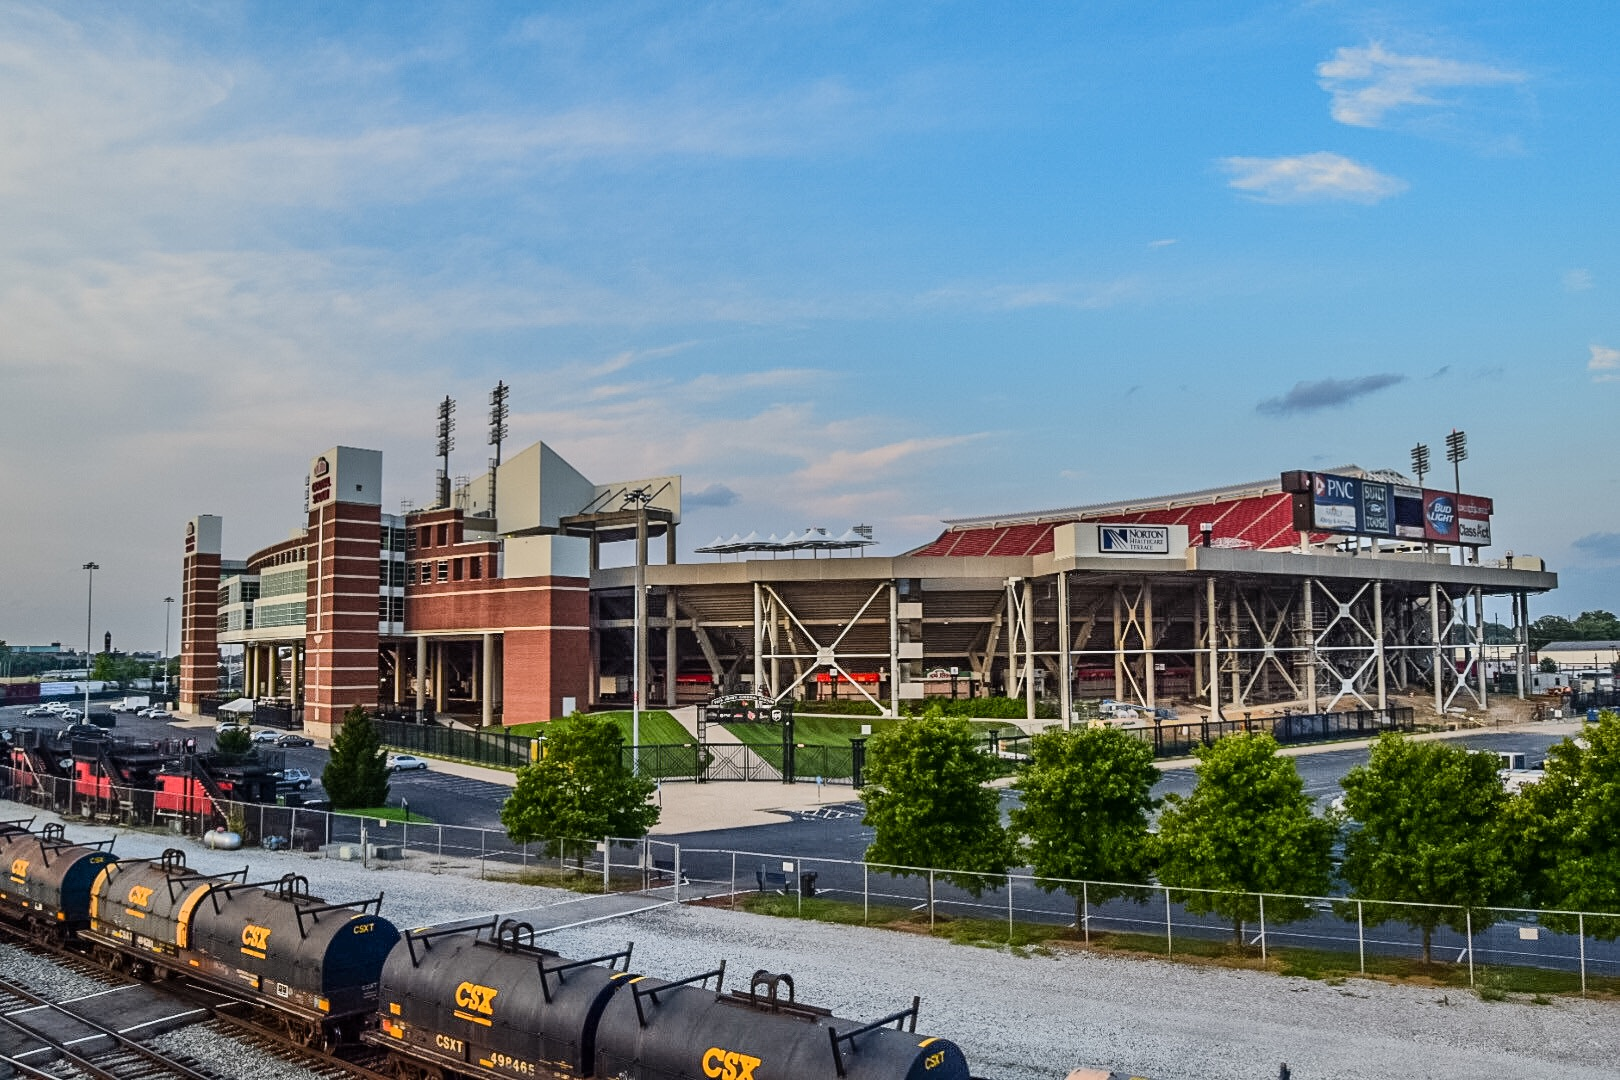 Papa John's Cardinal Stadium Photo by Seth Bloom. 2015